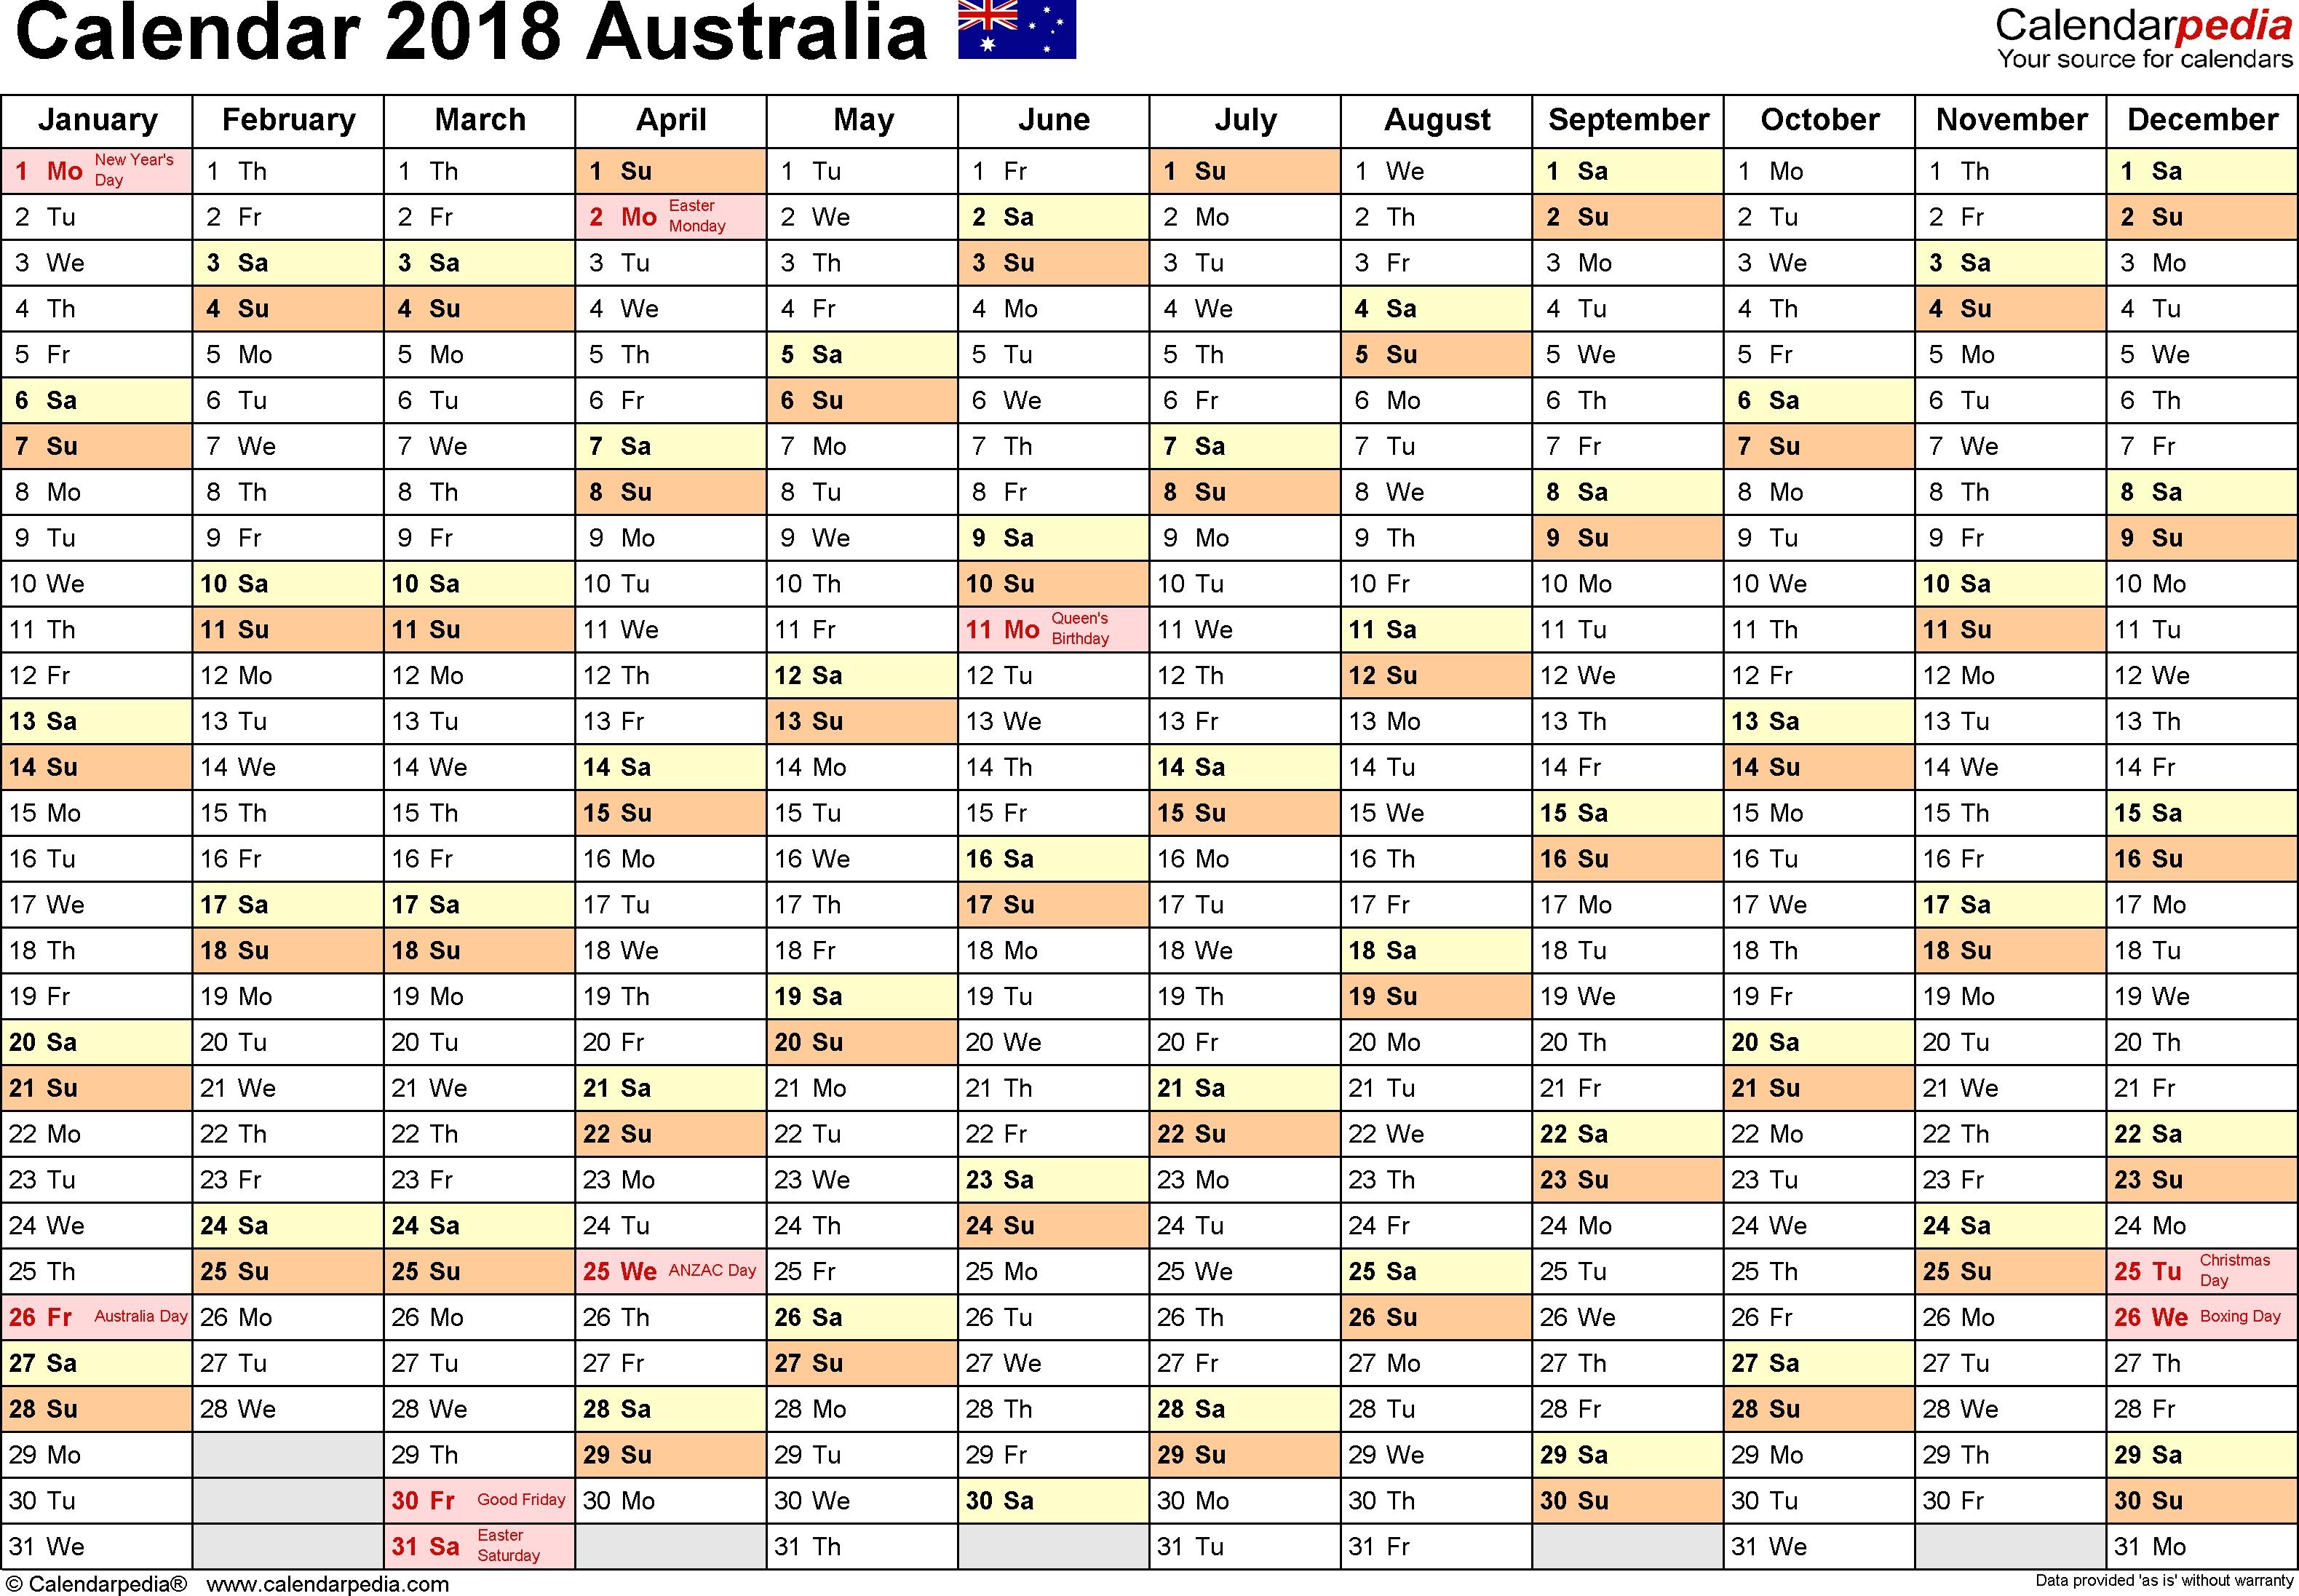 017 Calendar Australia Plans Financial Planning Dreaded  Financial Calendar Australia